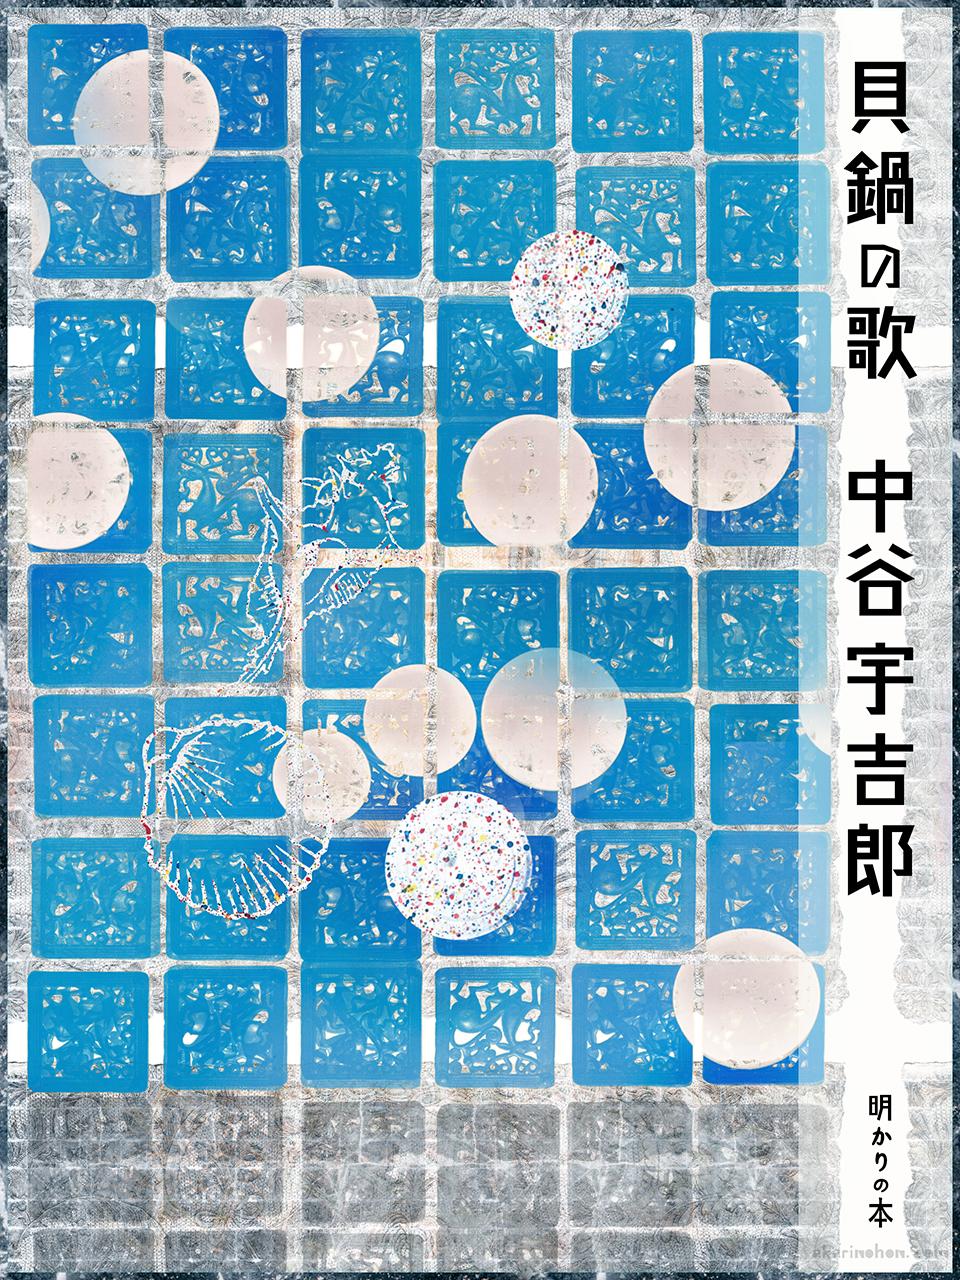 0000 - 貝鍋の歌 中谷宇吉郎